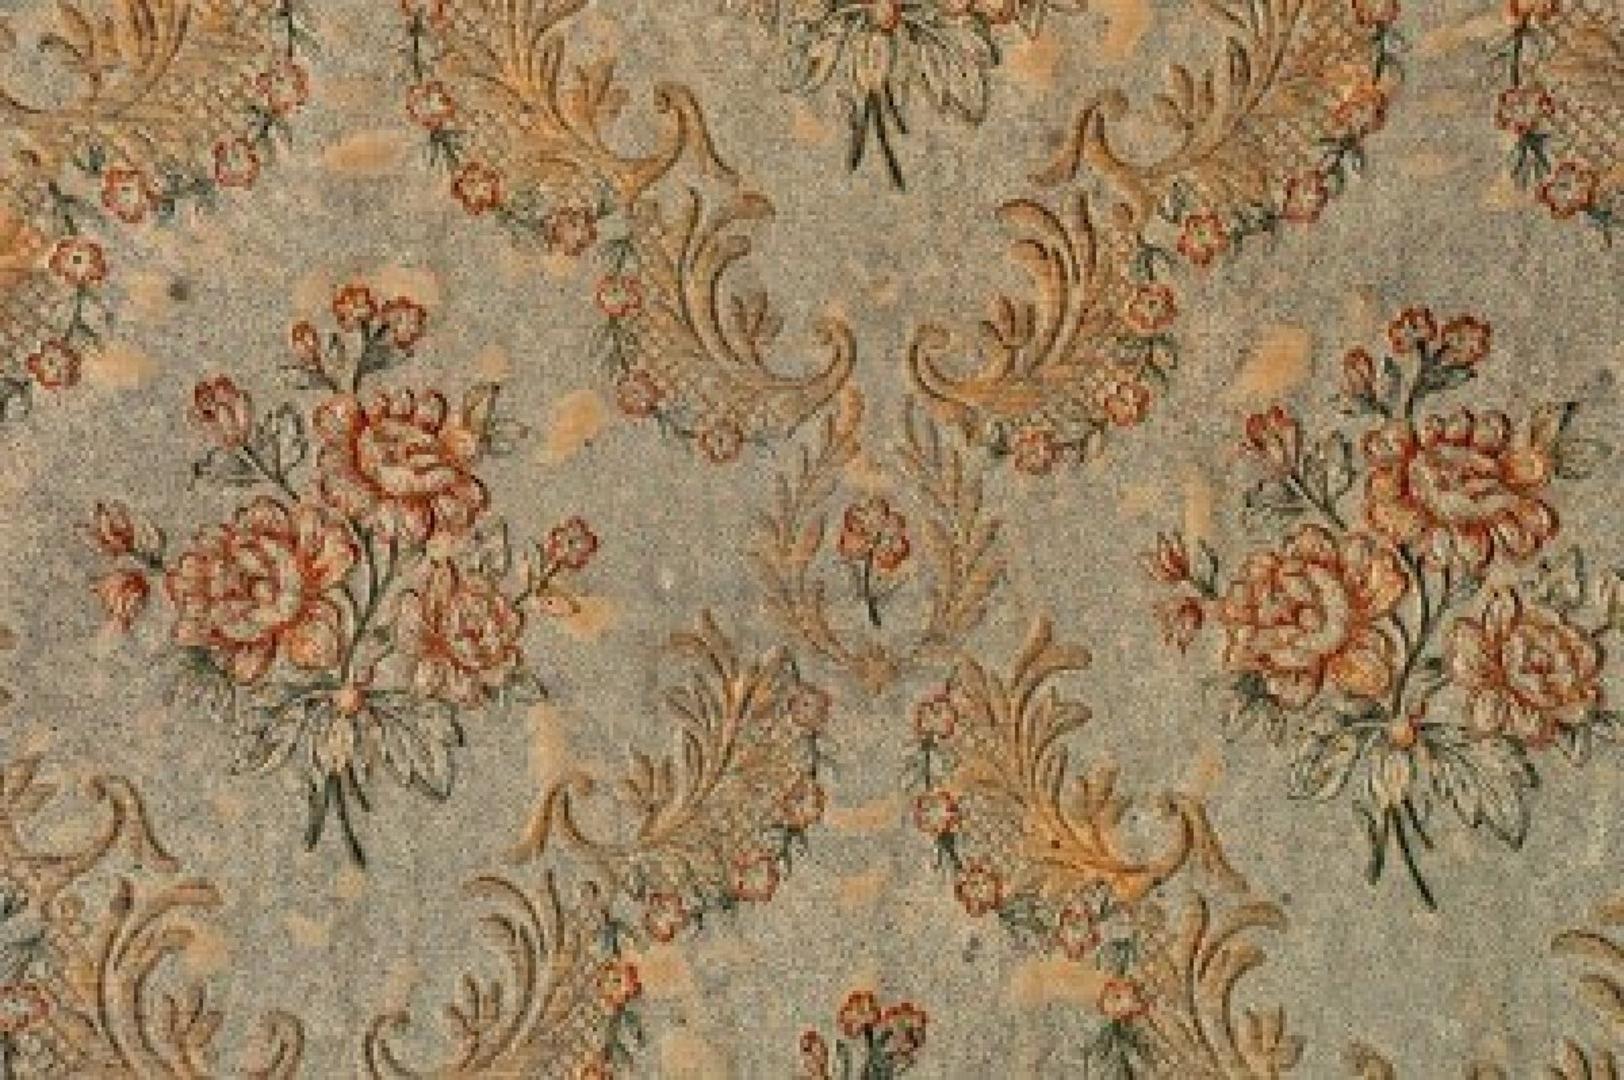 Vintage Victorian Wallpaper Desktop Image 1624x1080